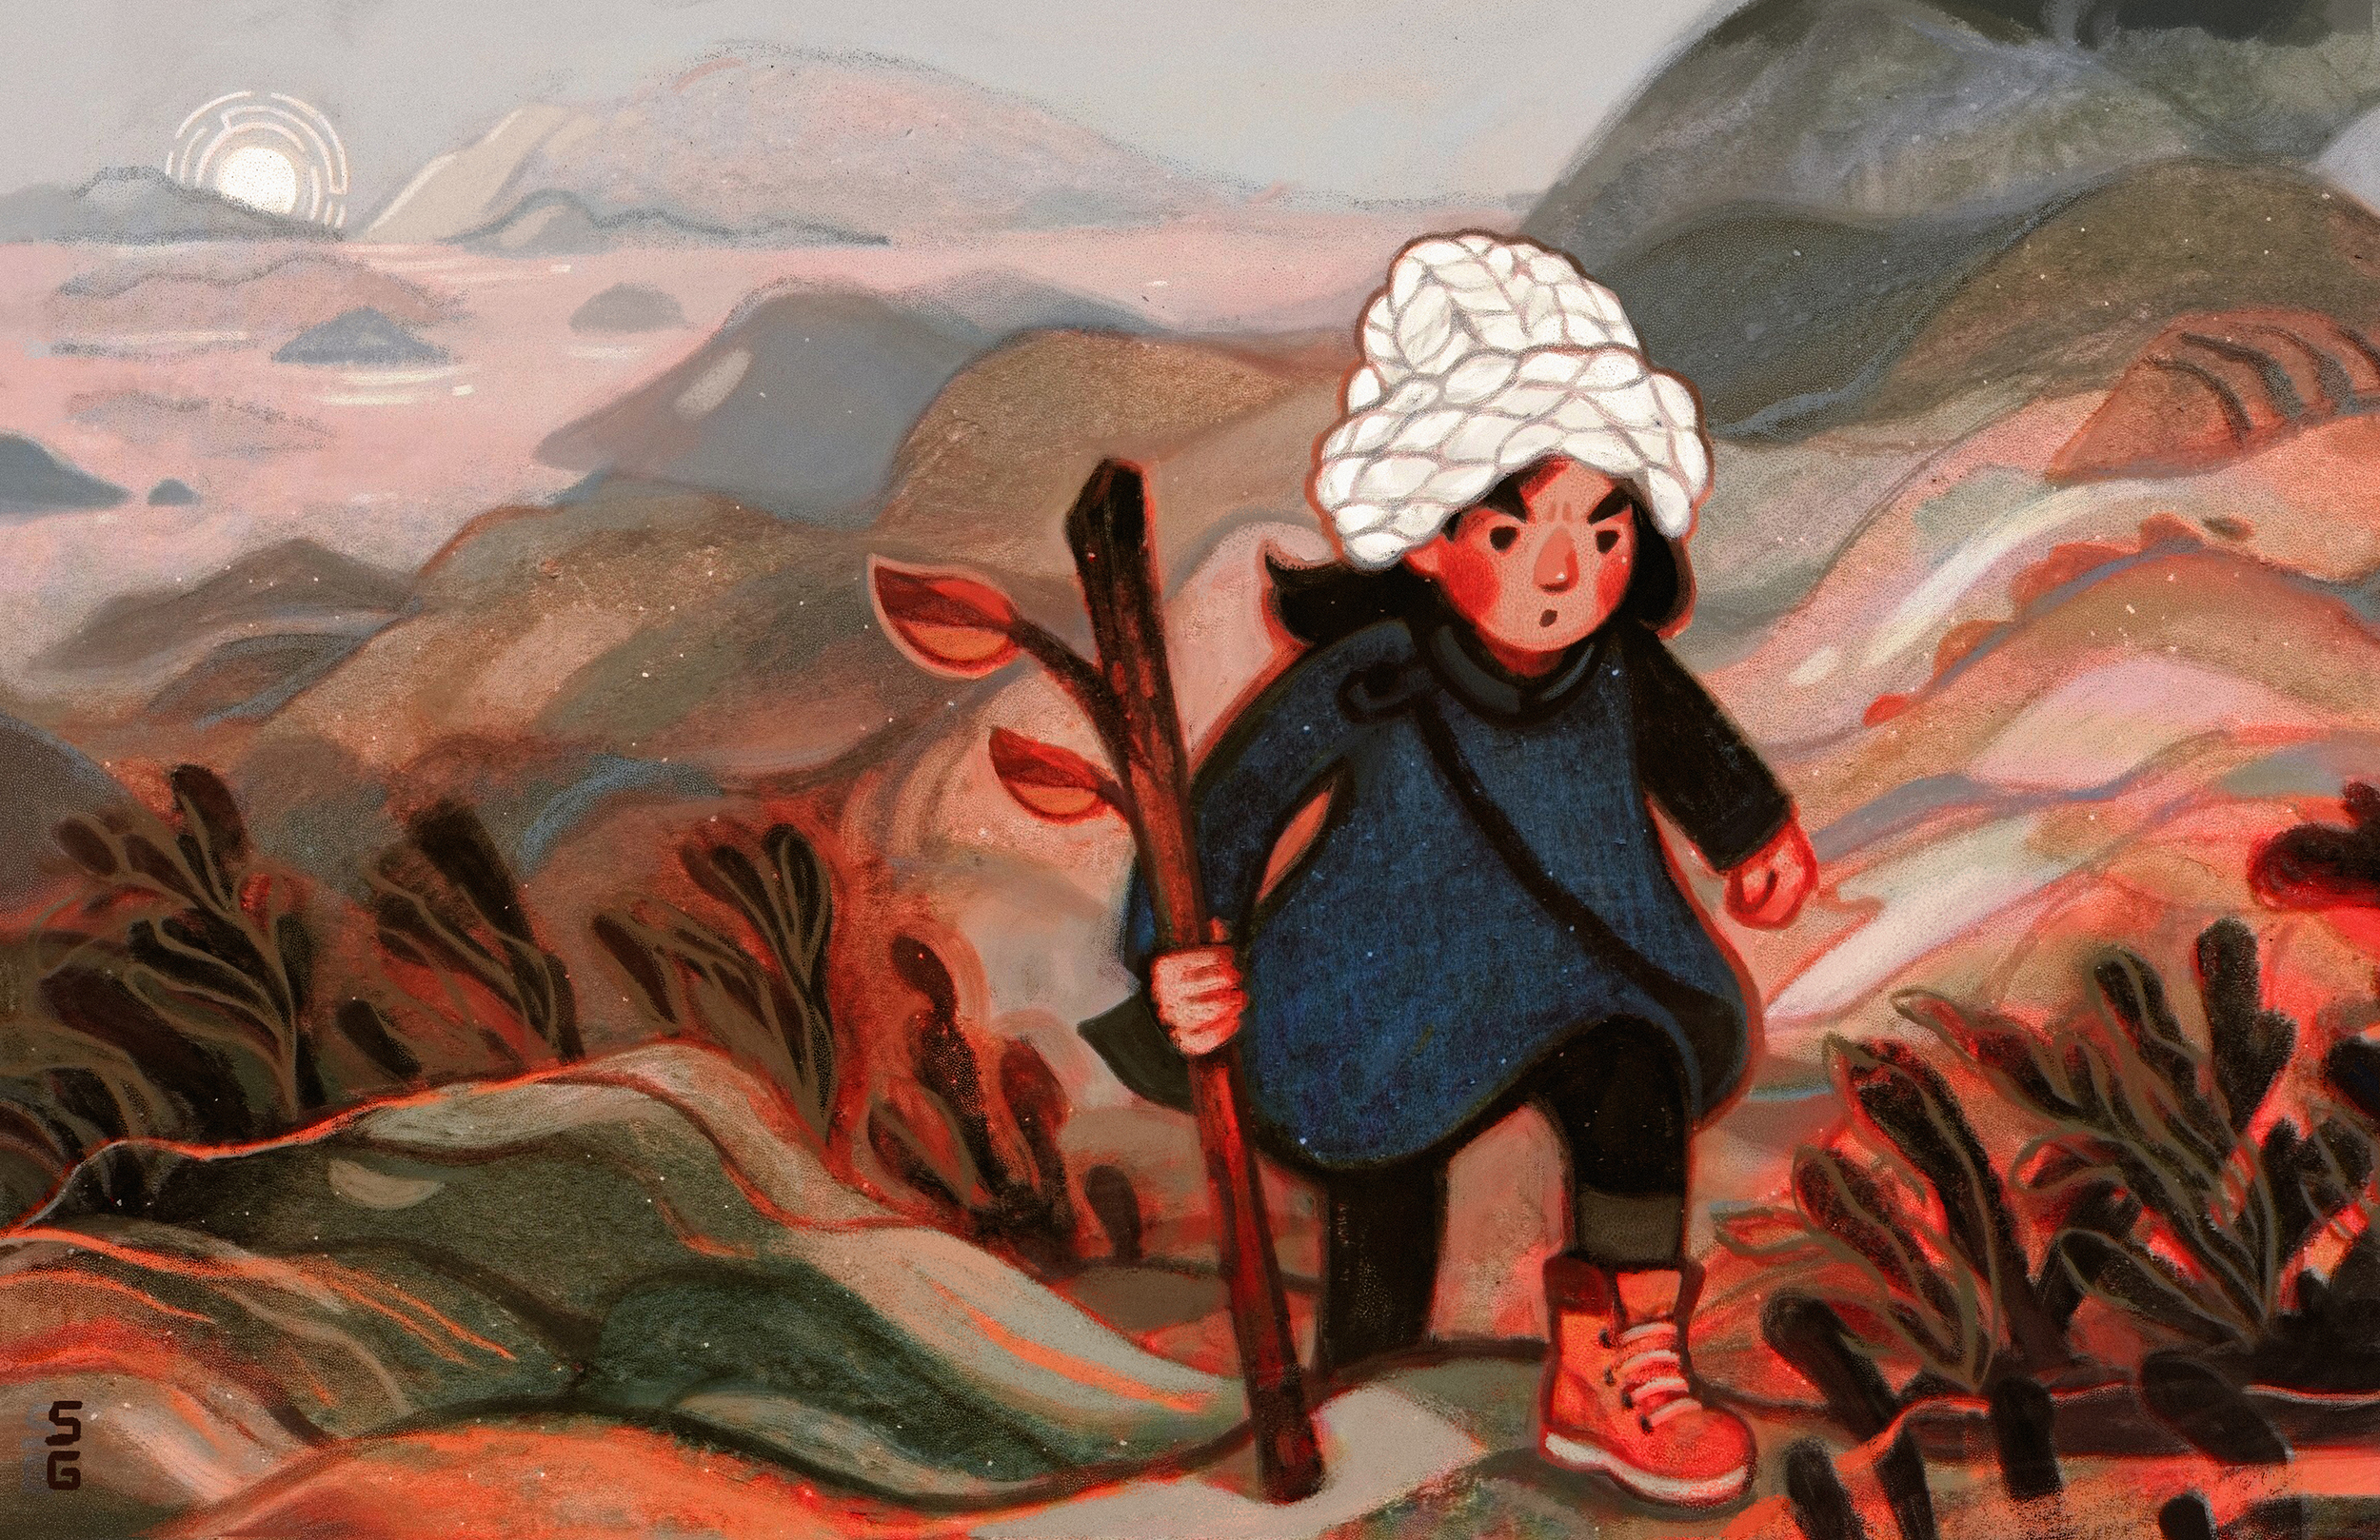 Journey by Sarah Gonzales